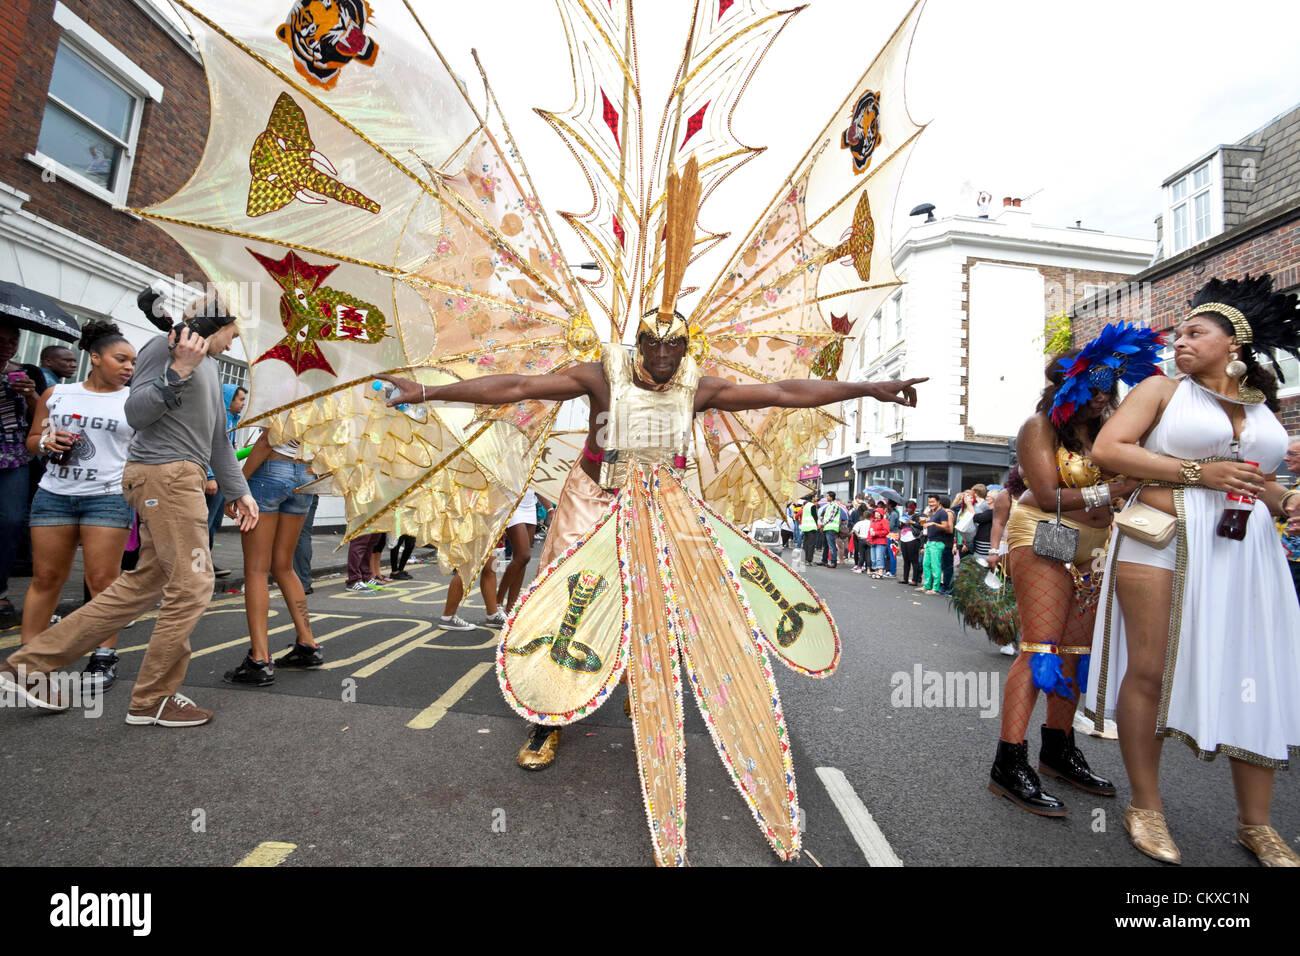 August 27th, 2012, London, UK. Notting Hill Carnival male dancer wears fantasy costume. - Stock Image